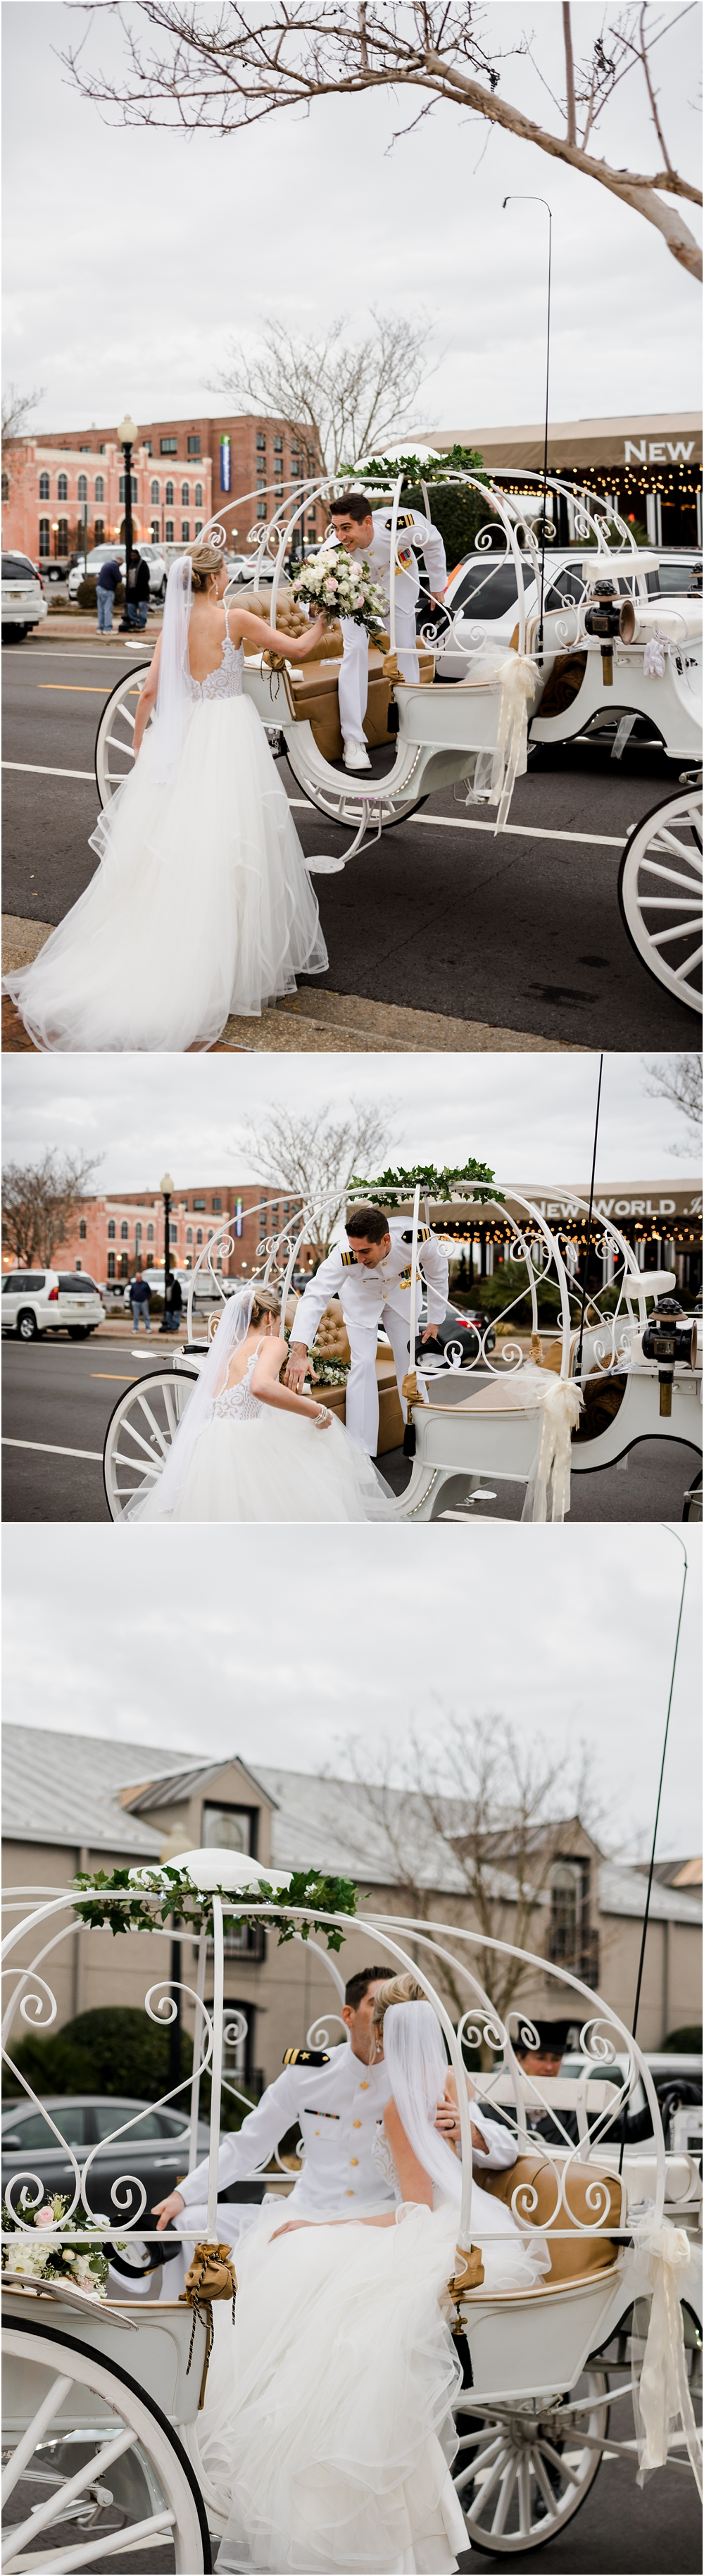 oconnor-pensacola-florida-wedding-photographer-kiersten-taylor-63.jpg